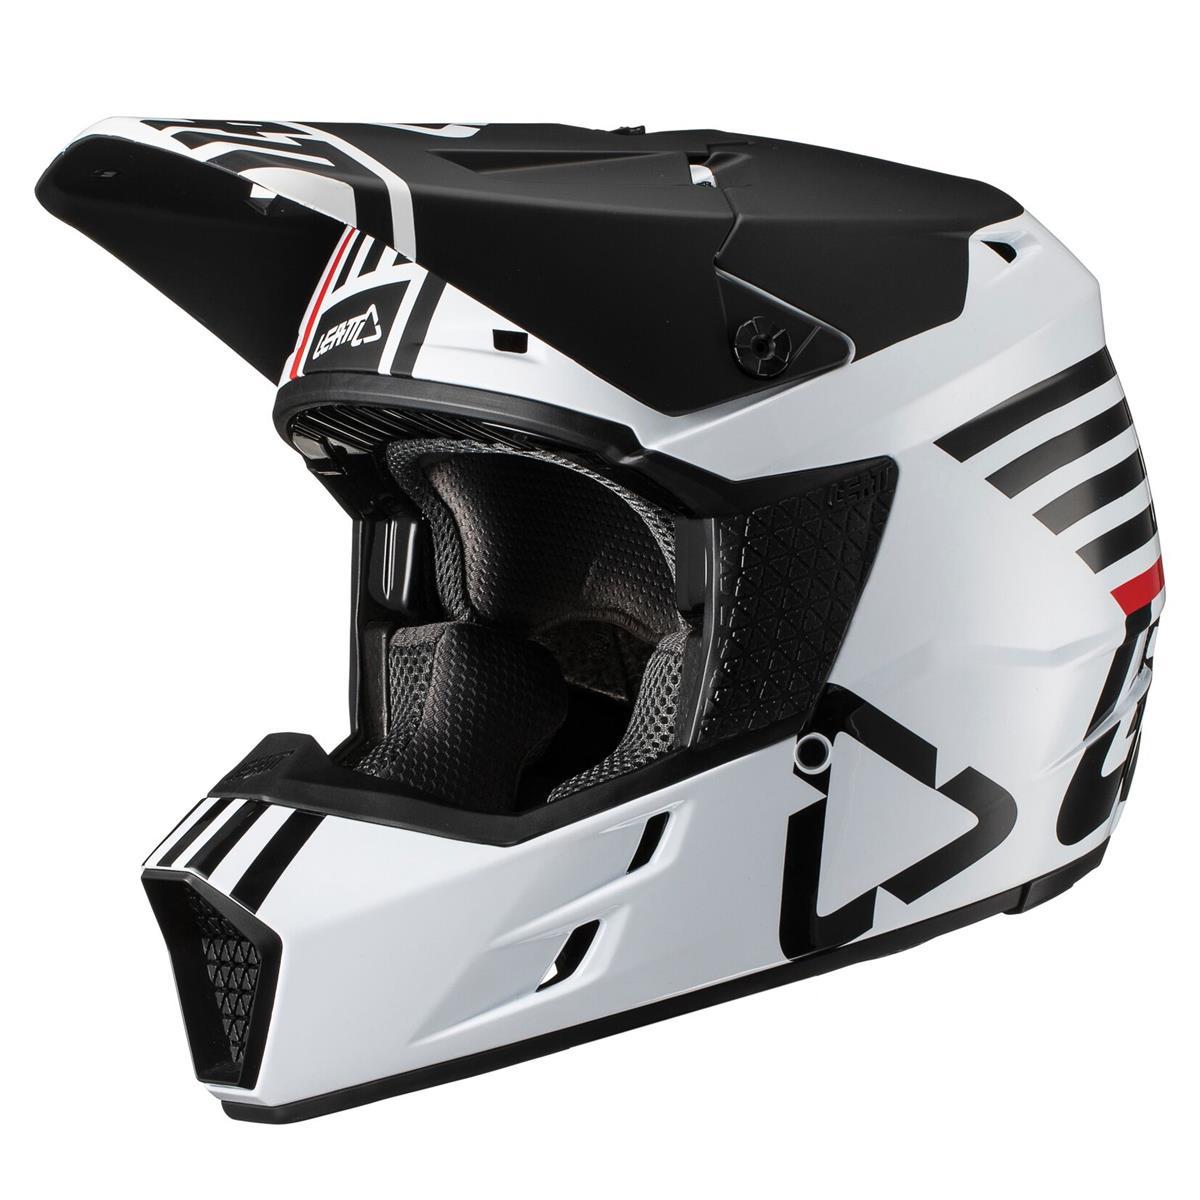 Leatt Helm GPX 3.5 V19.2 Weiß